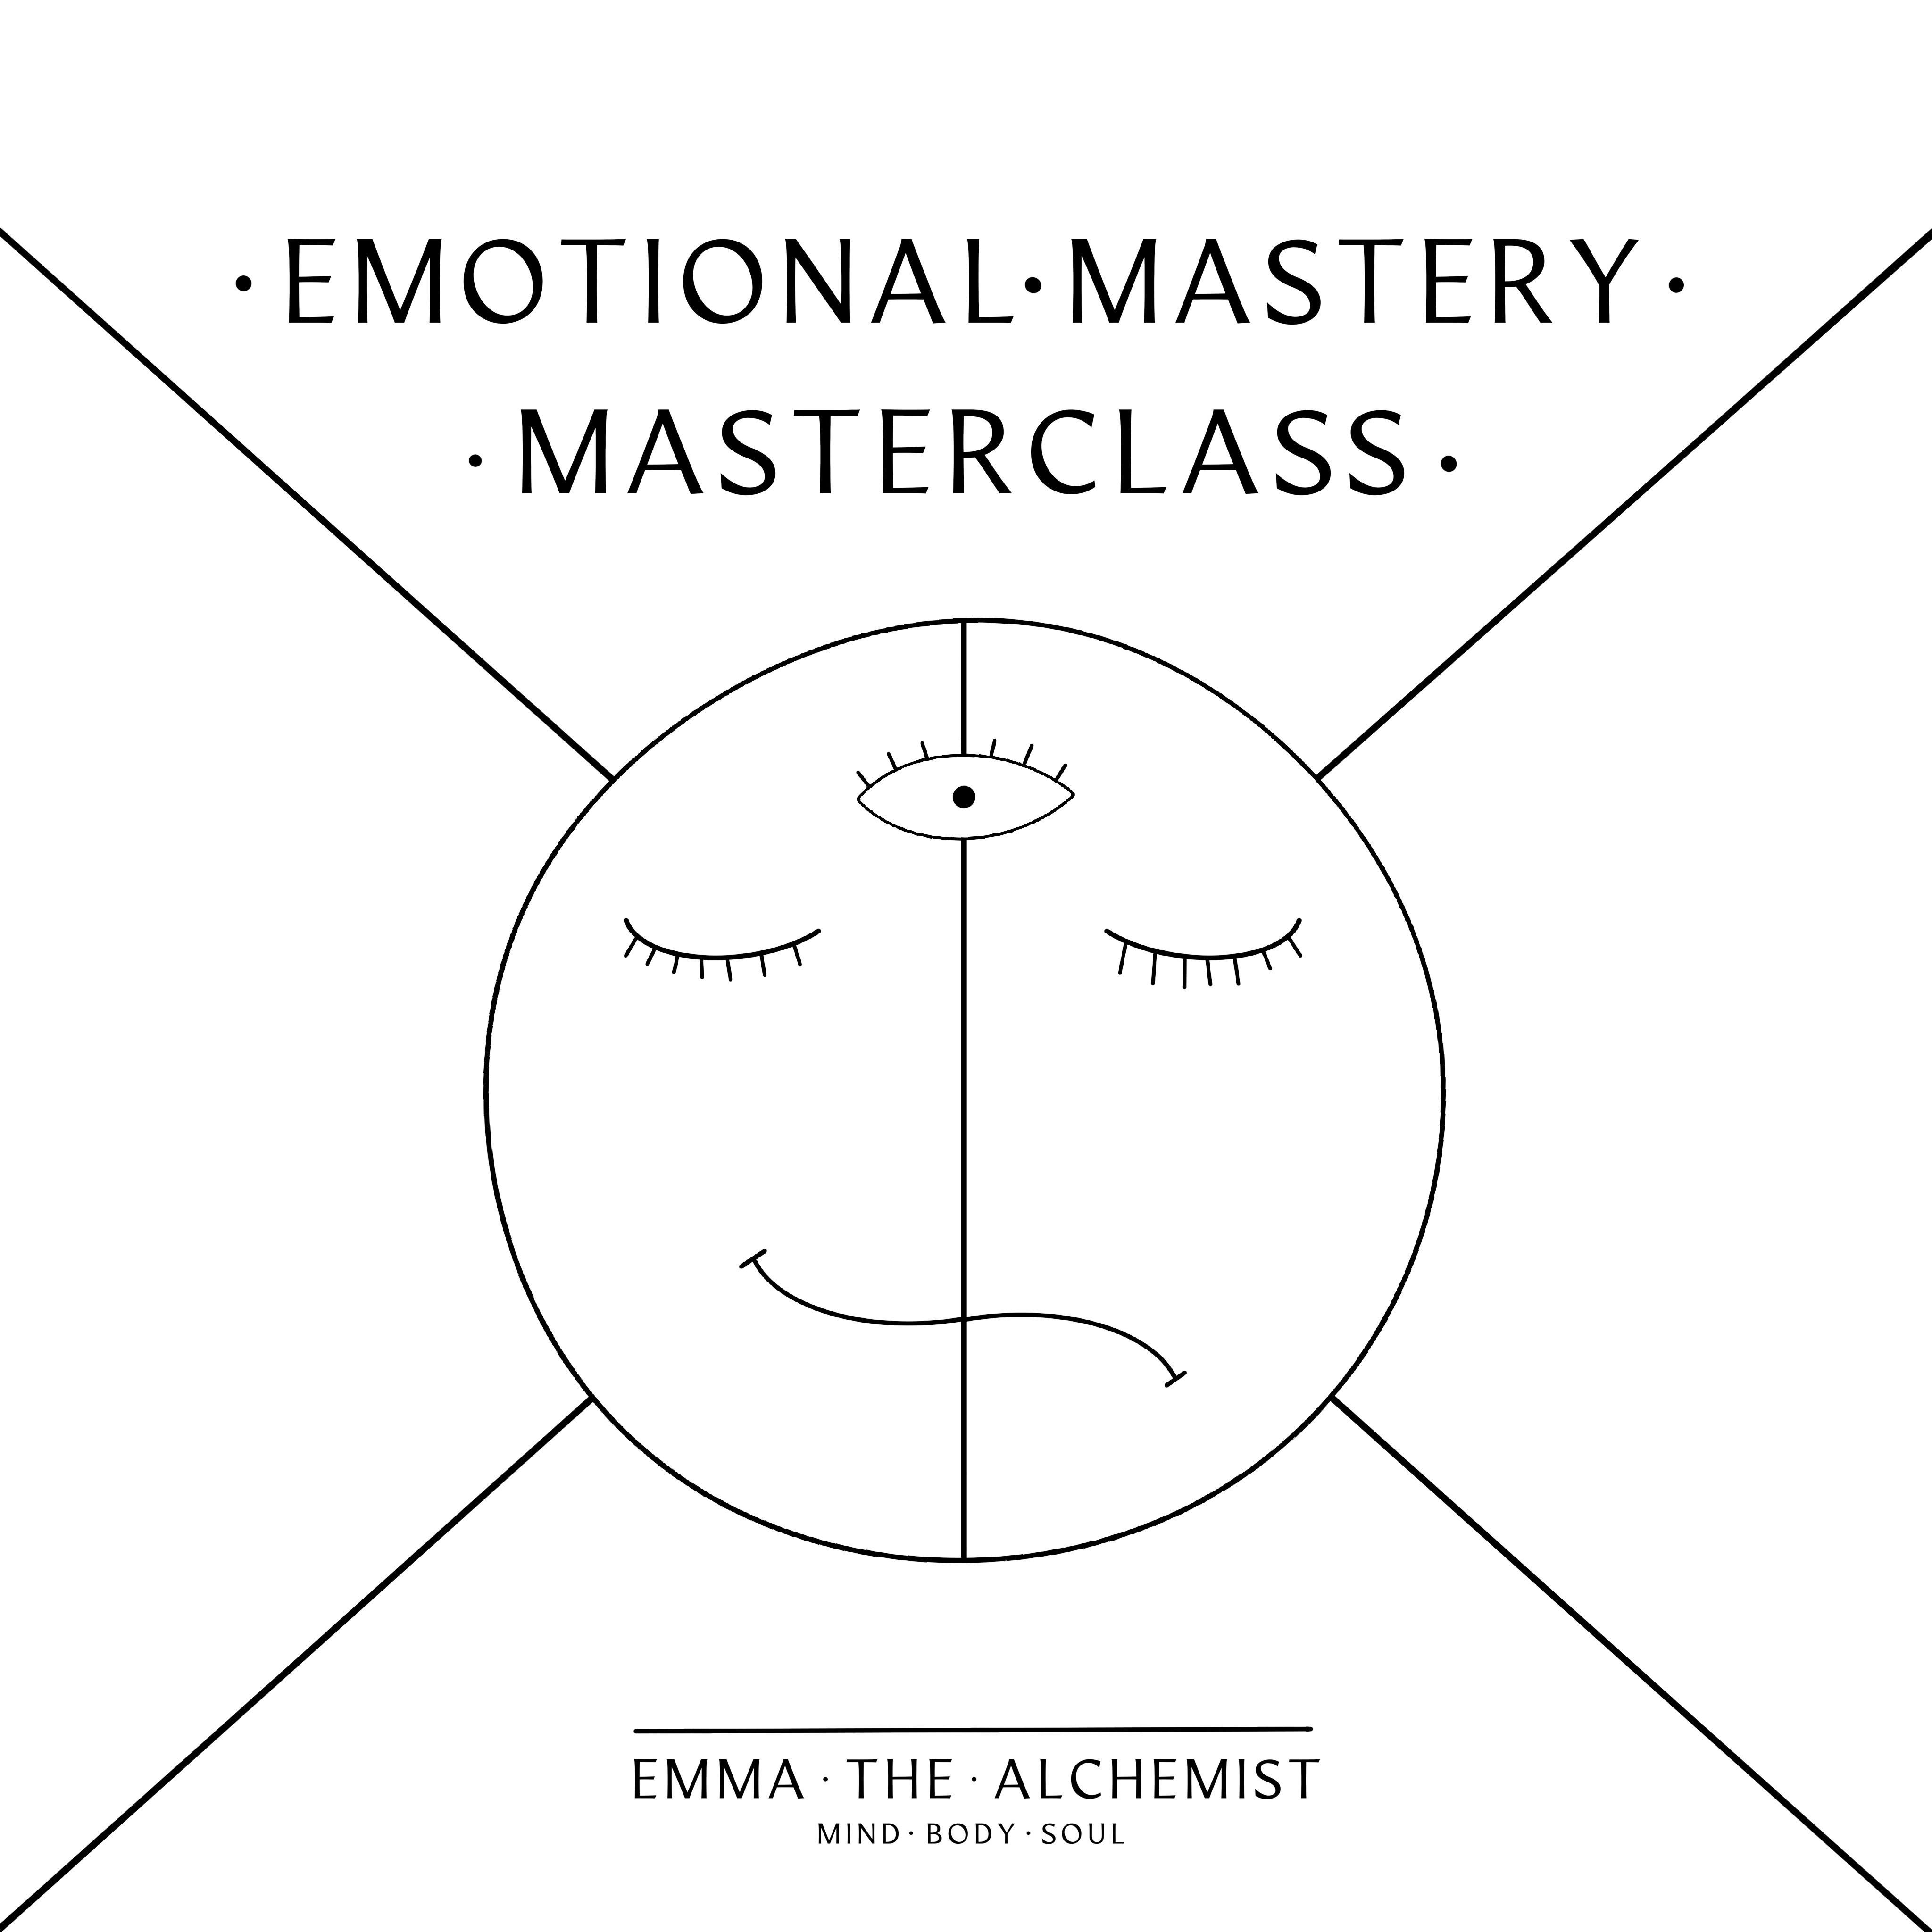 Emotional Mastery Masterclass